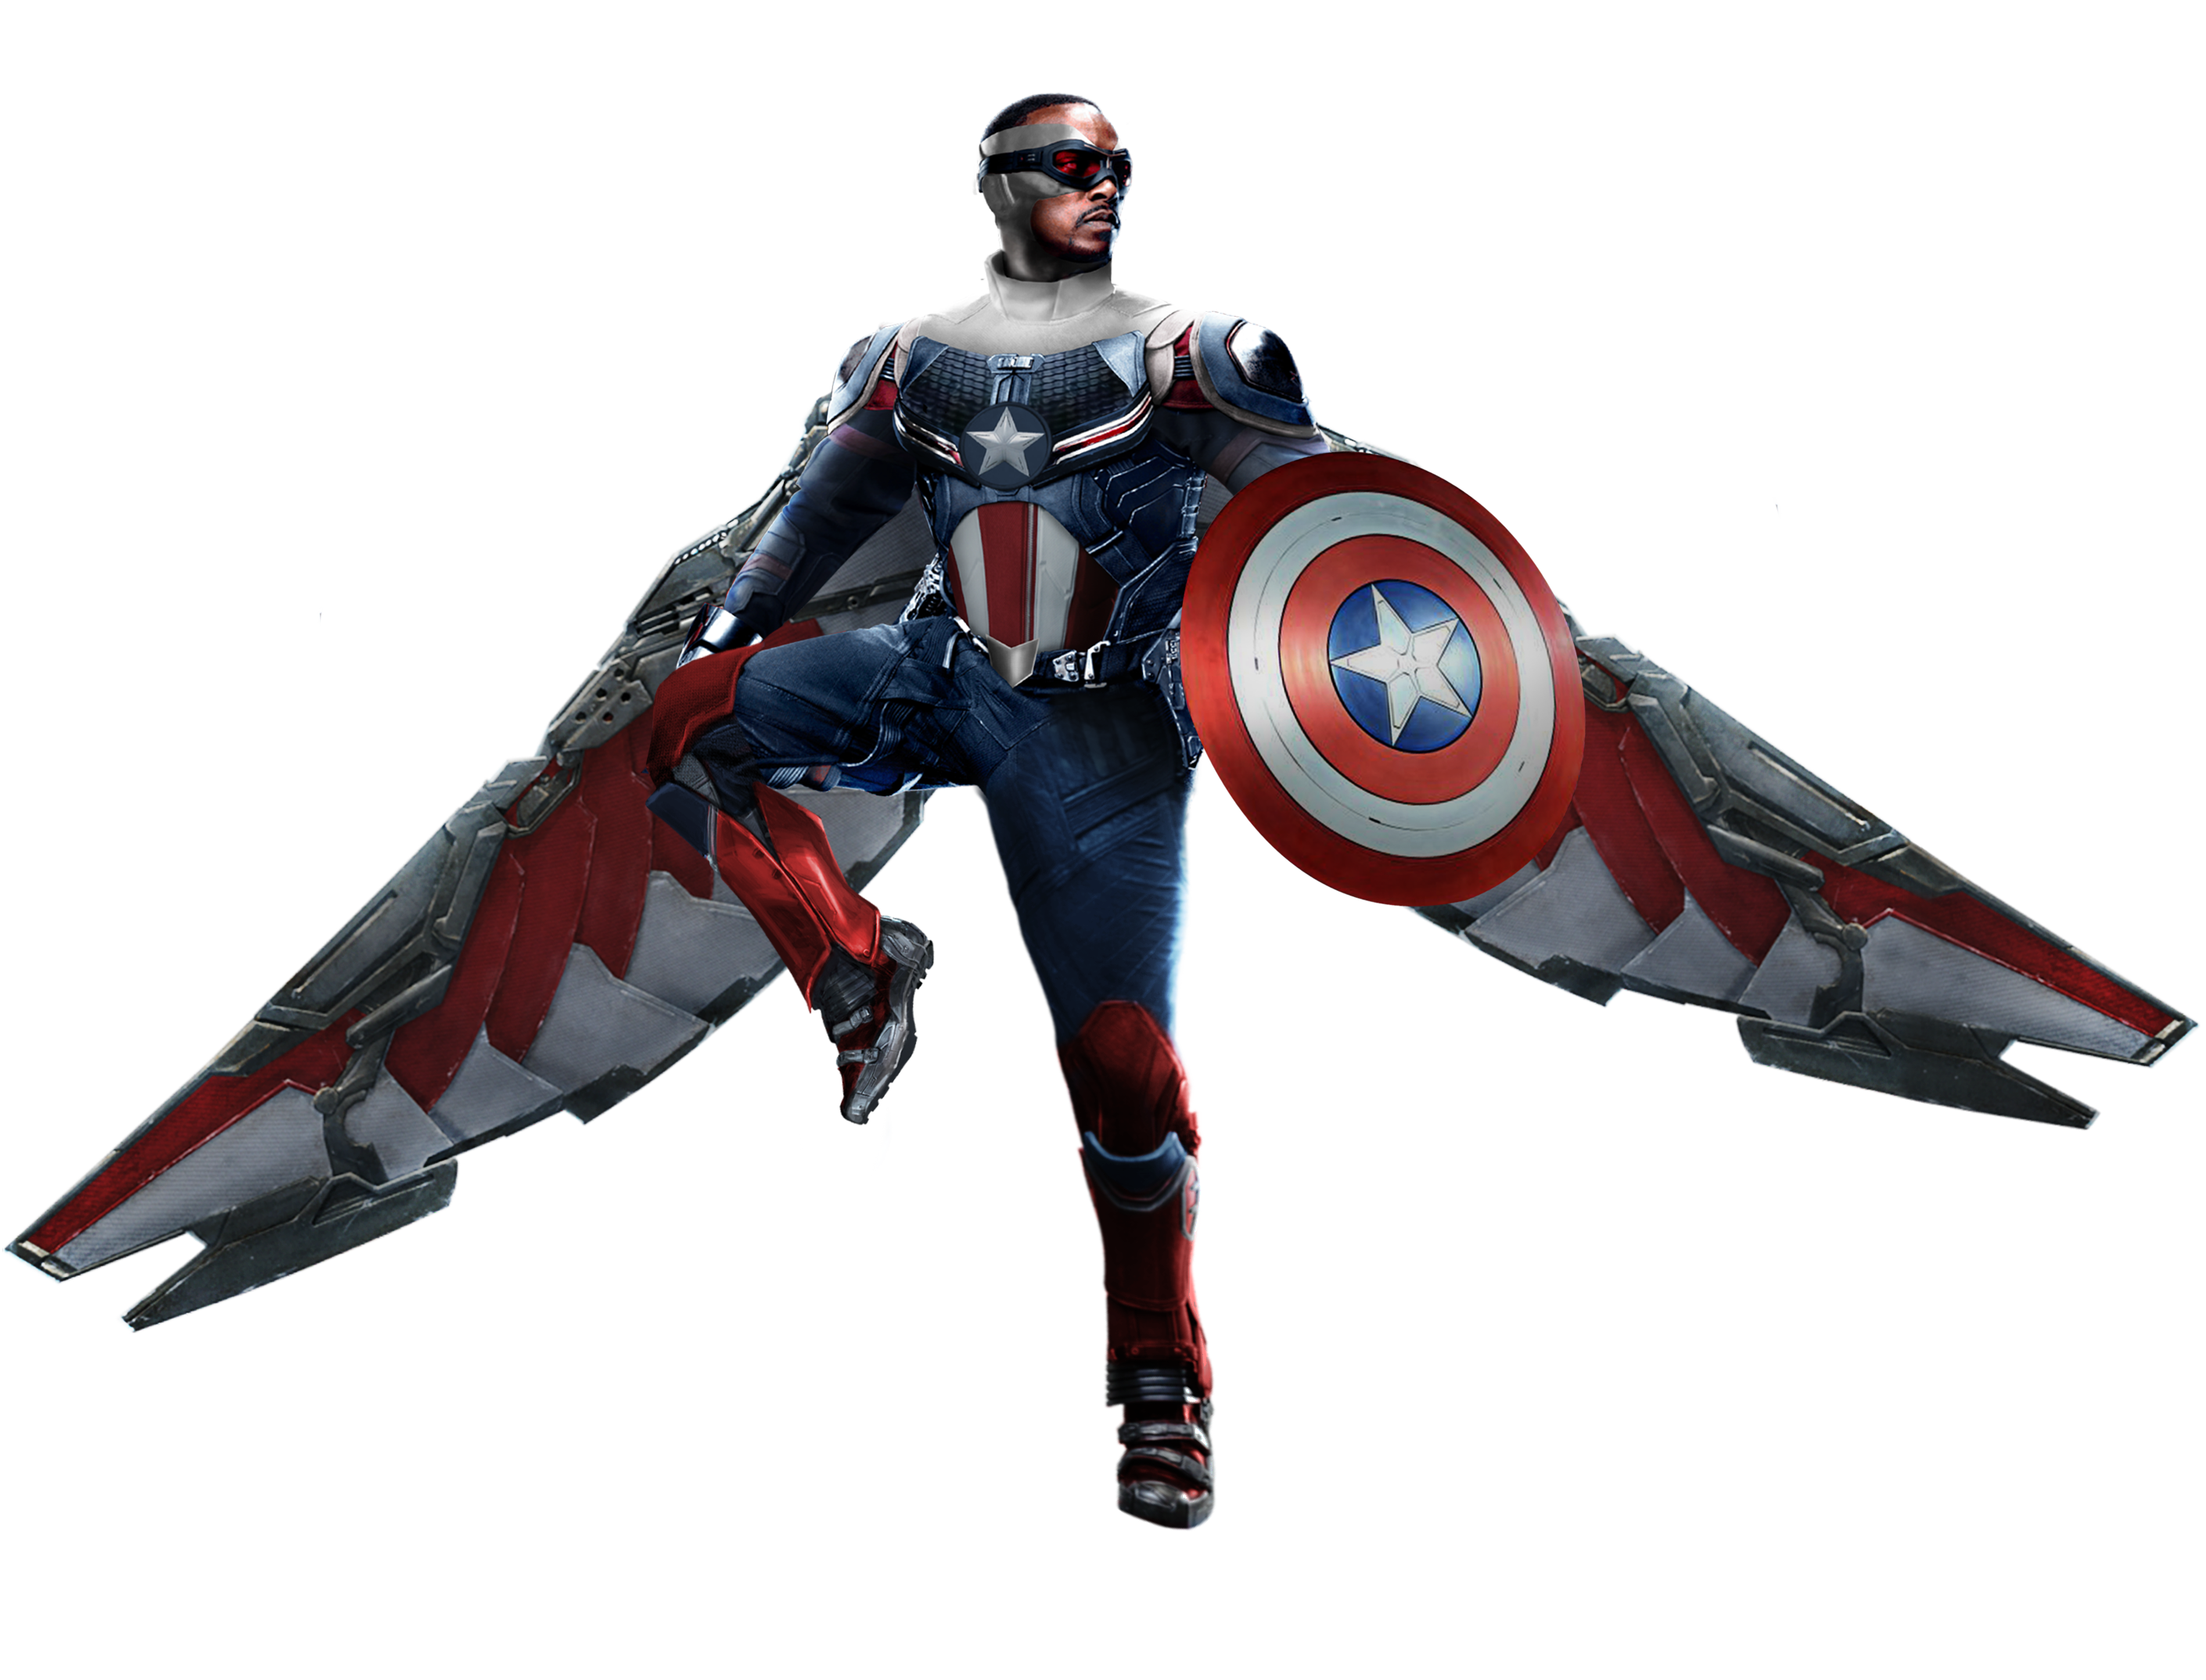 Falcon Captain America Disney+ by GUERRERO3628 on DeviantArt